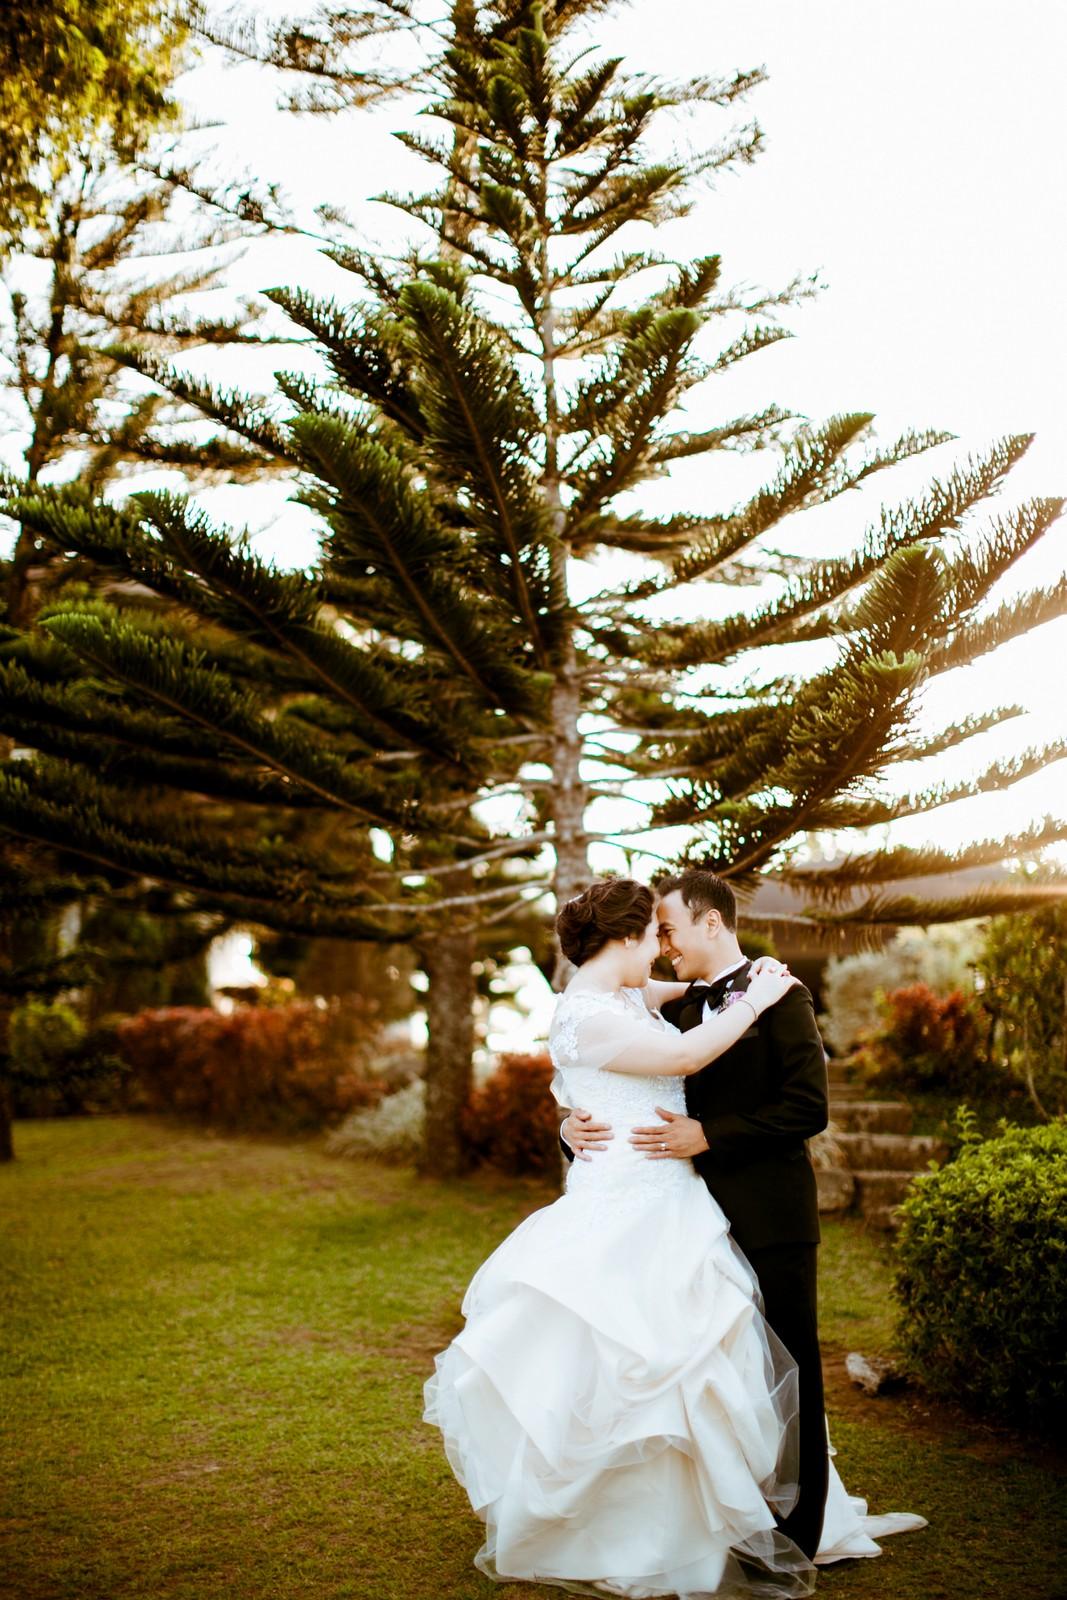 wedding anna paolo89-001.jpg